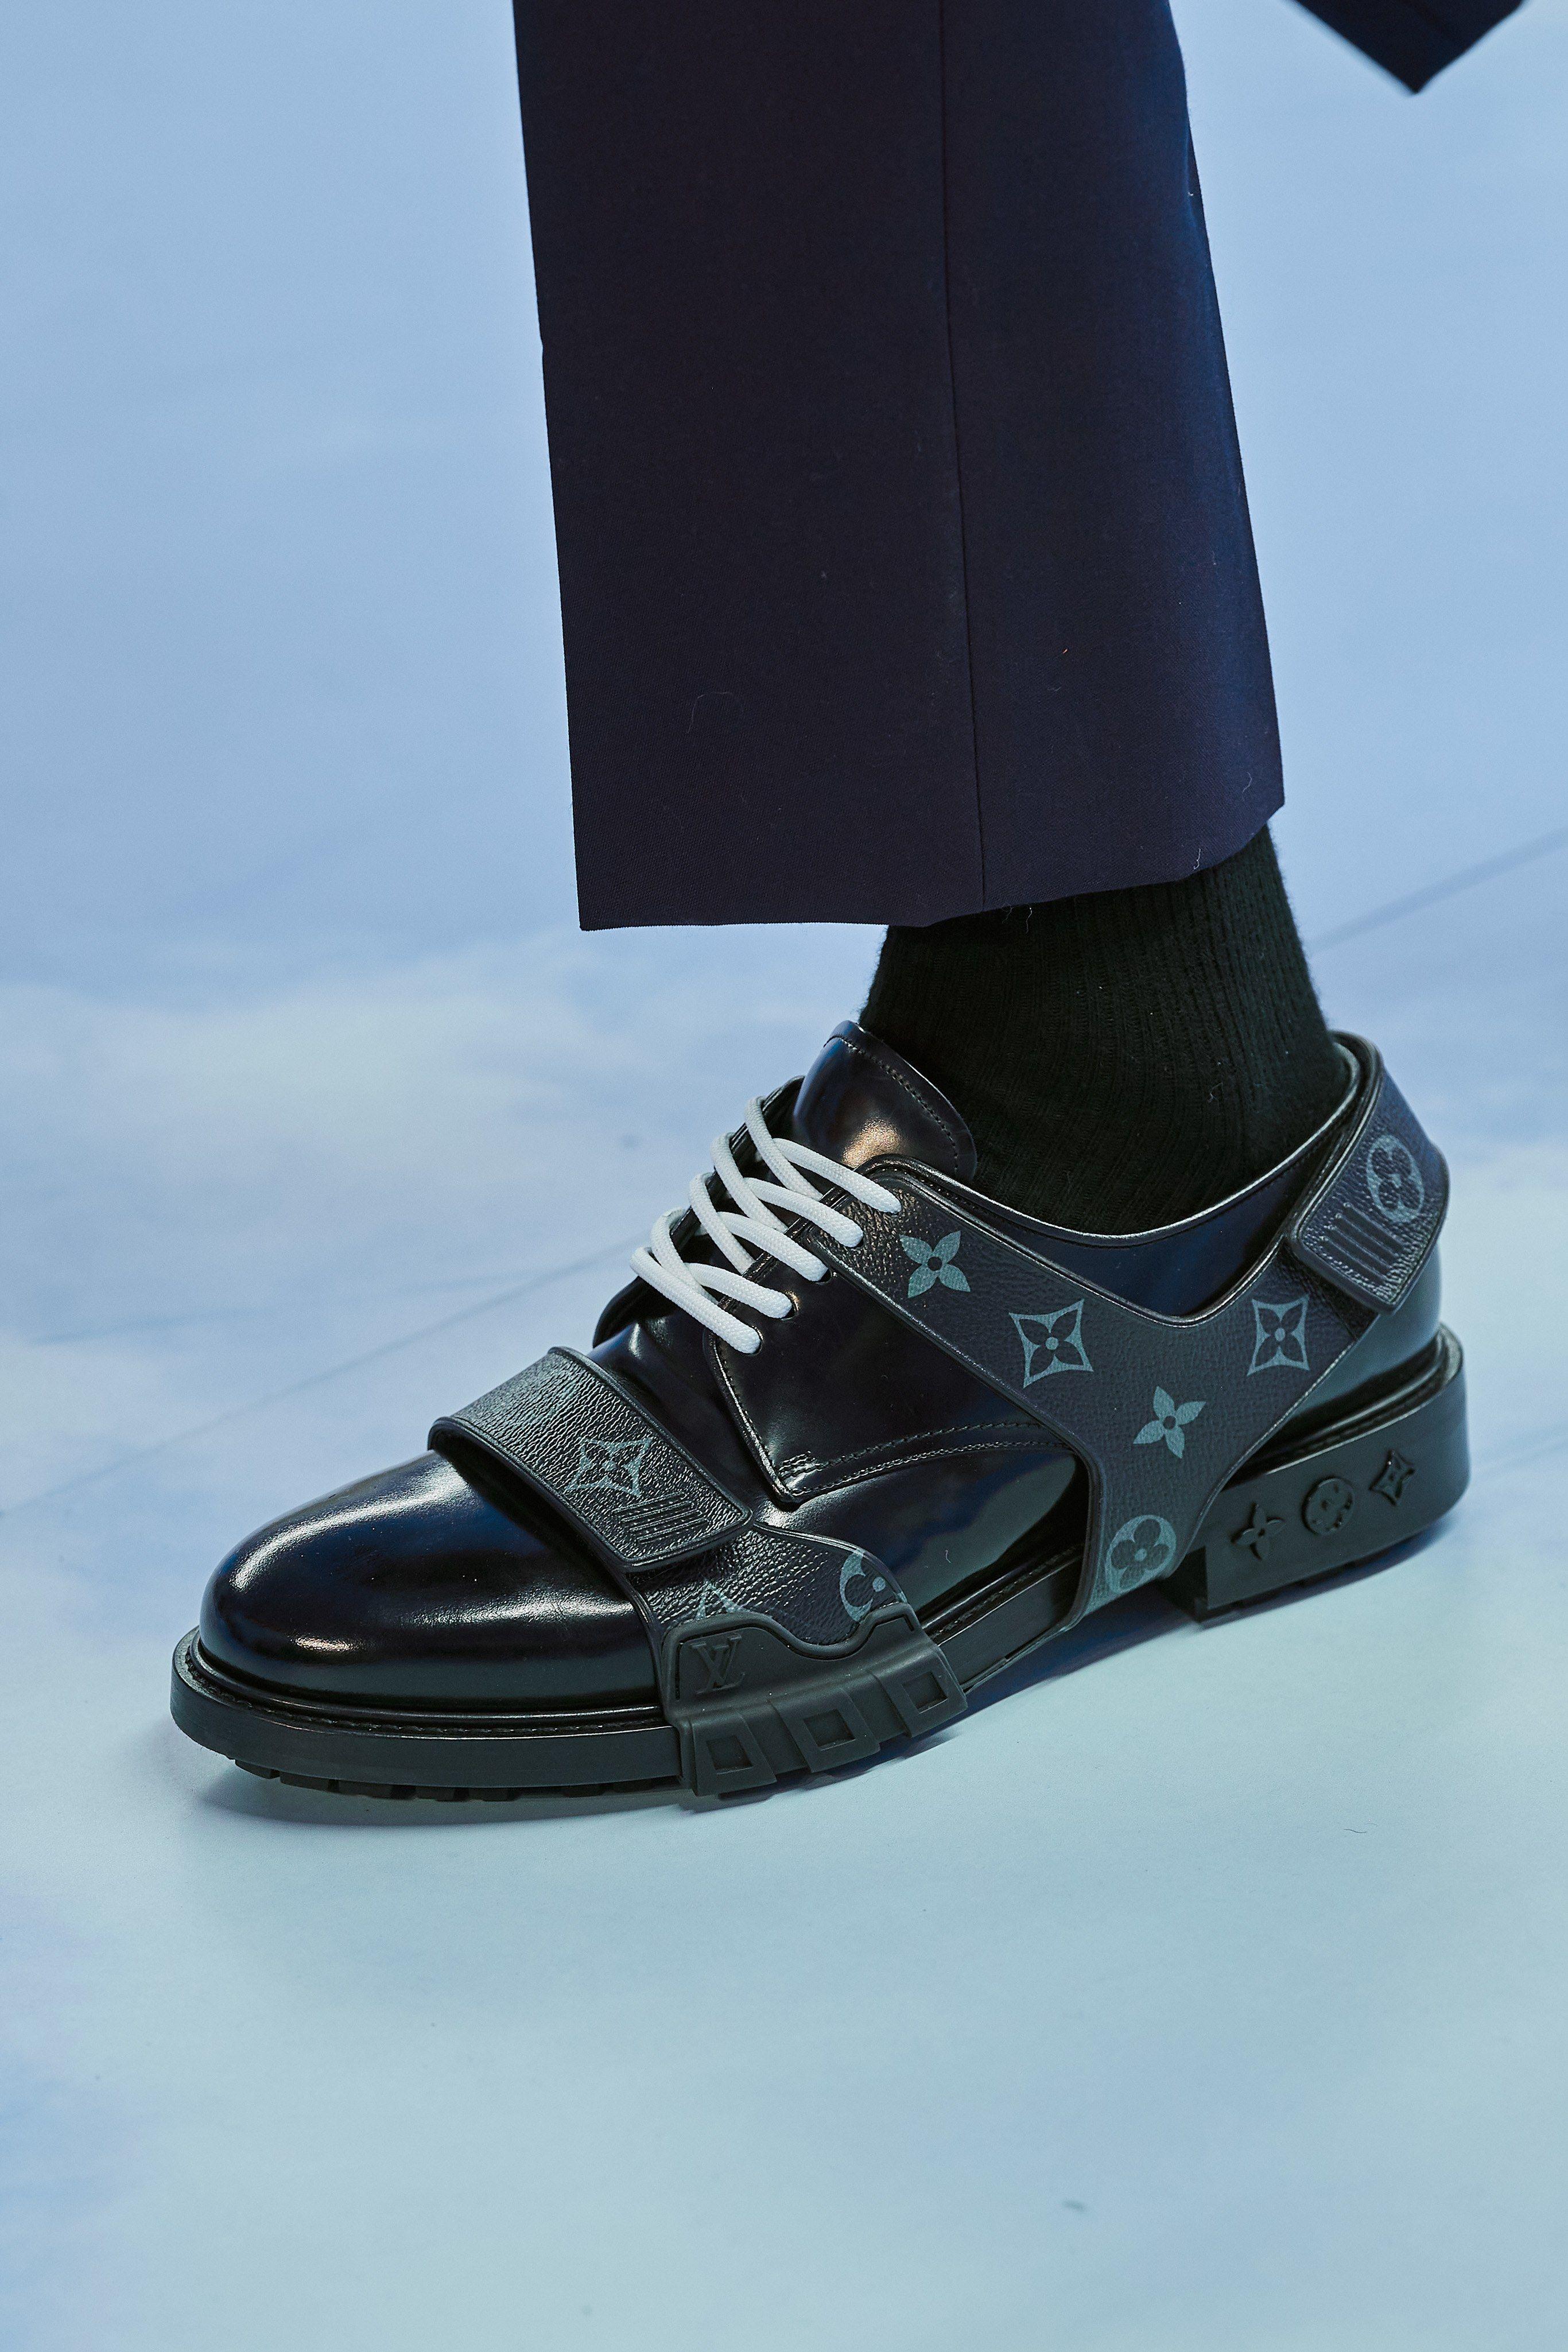 Louis Vuitton Fall 2020 Menswear